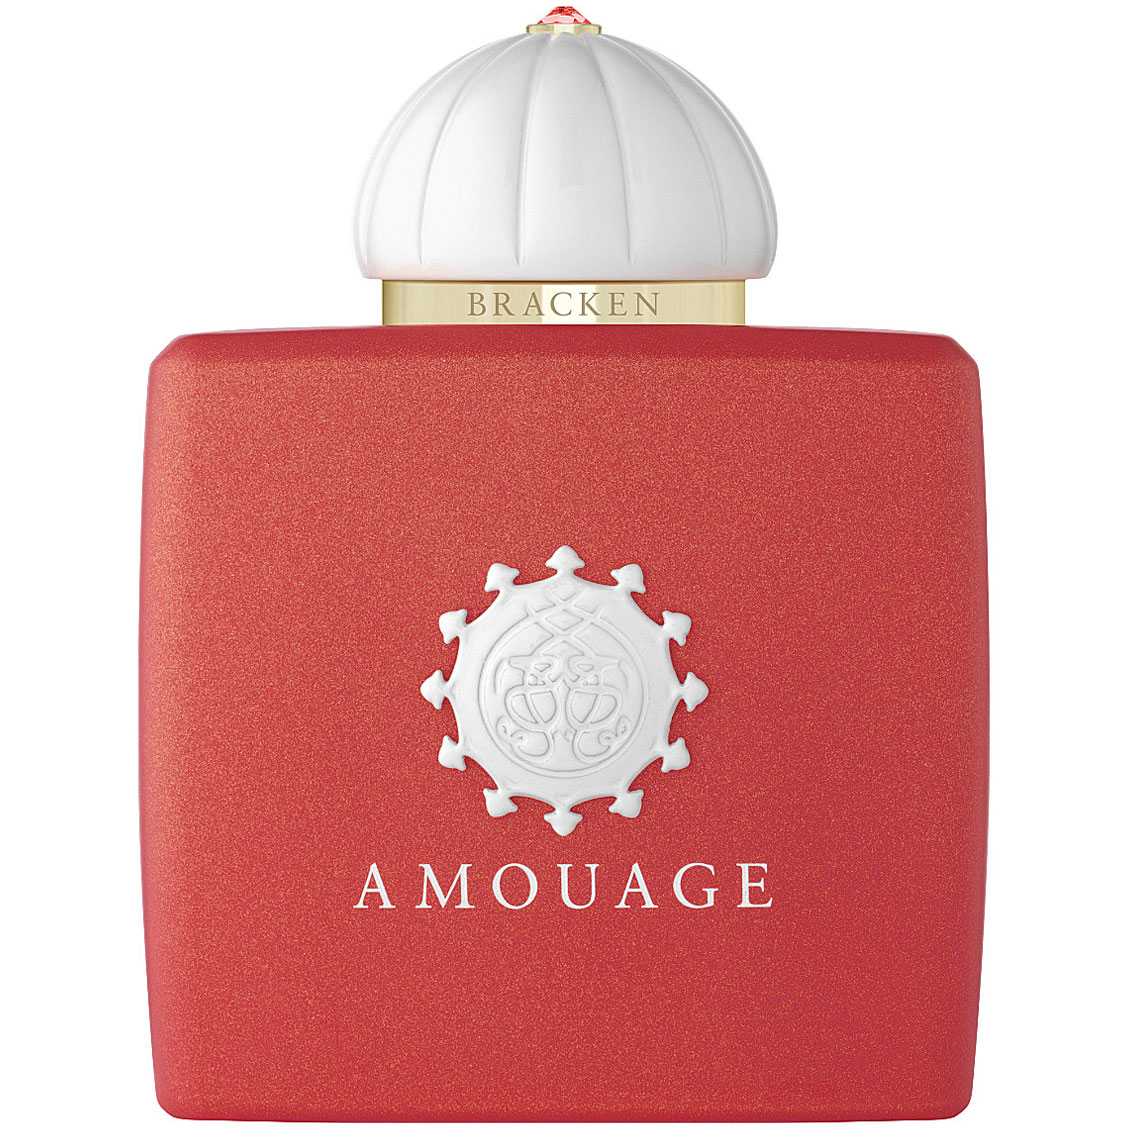 Afbeelding van Amouage Bracken Woman 100 ml eau de parfum spray